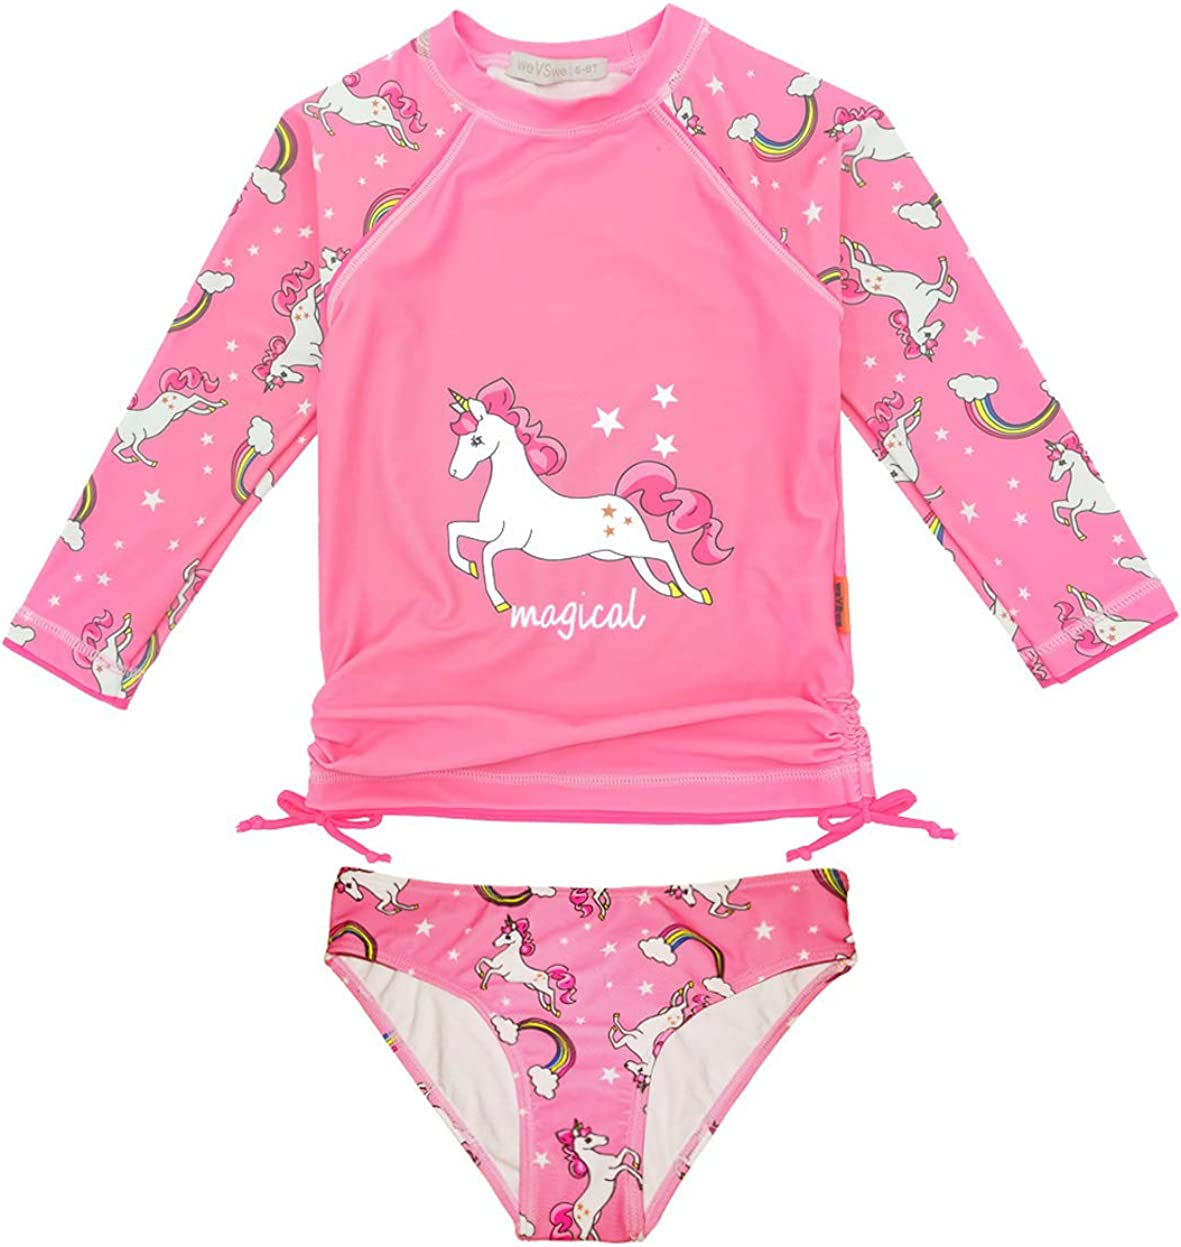 Max 51% OFF weVSwe Girls Rash Guard Swimsuit Virginia Beach Mall Rare Suit Hem UPF Bathing Cuffs